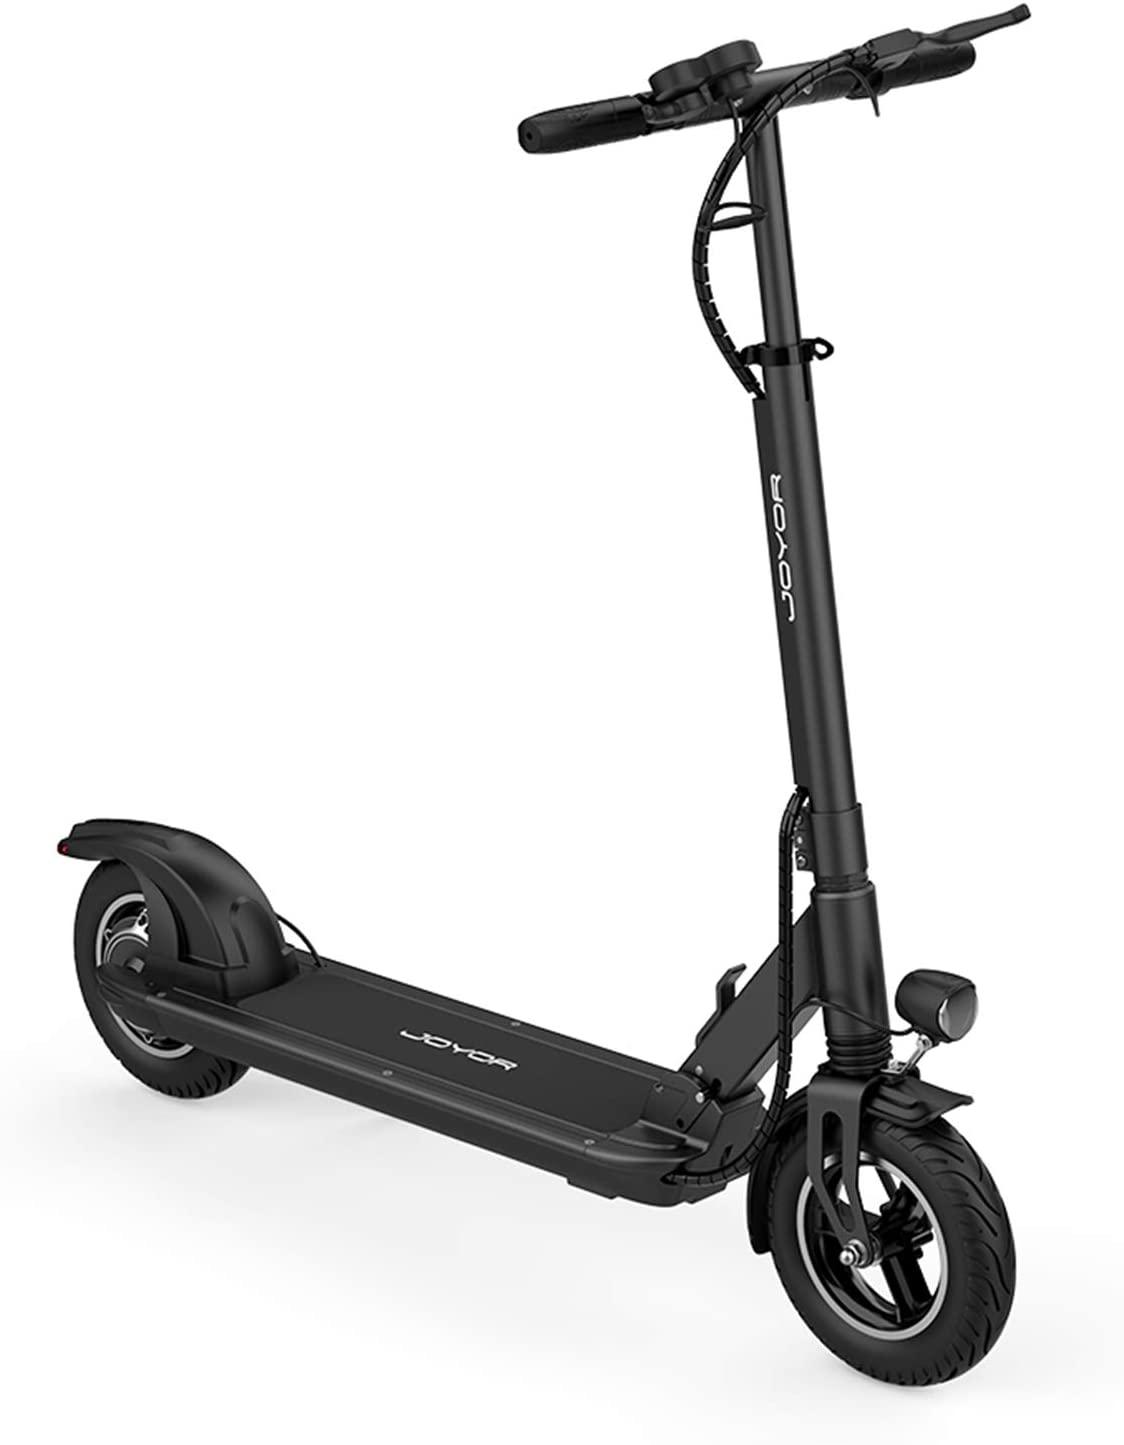 joyor x5s electric scooter